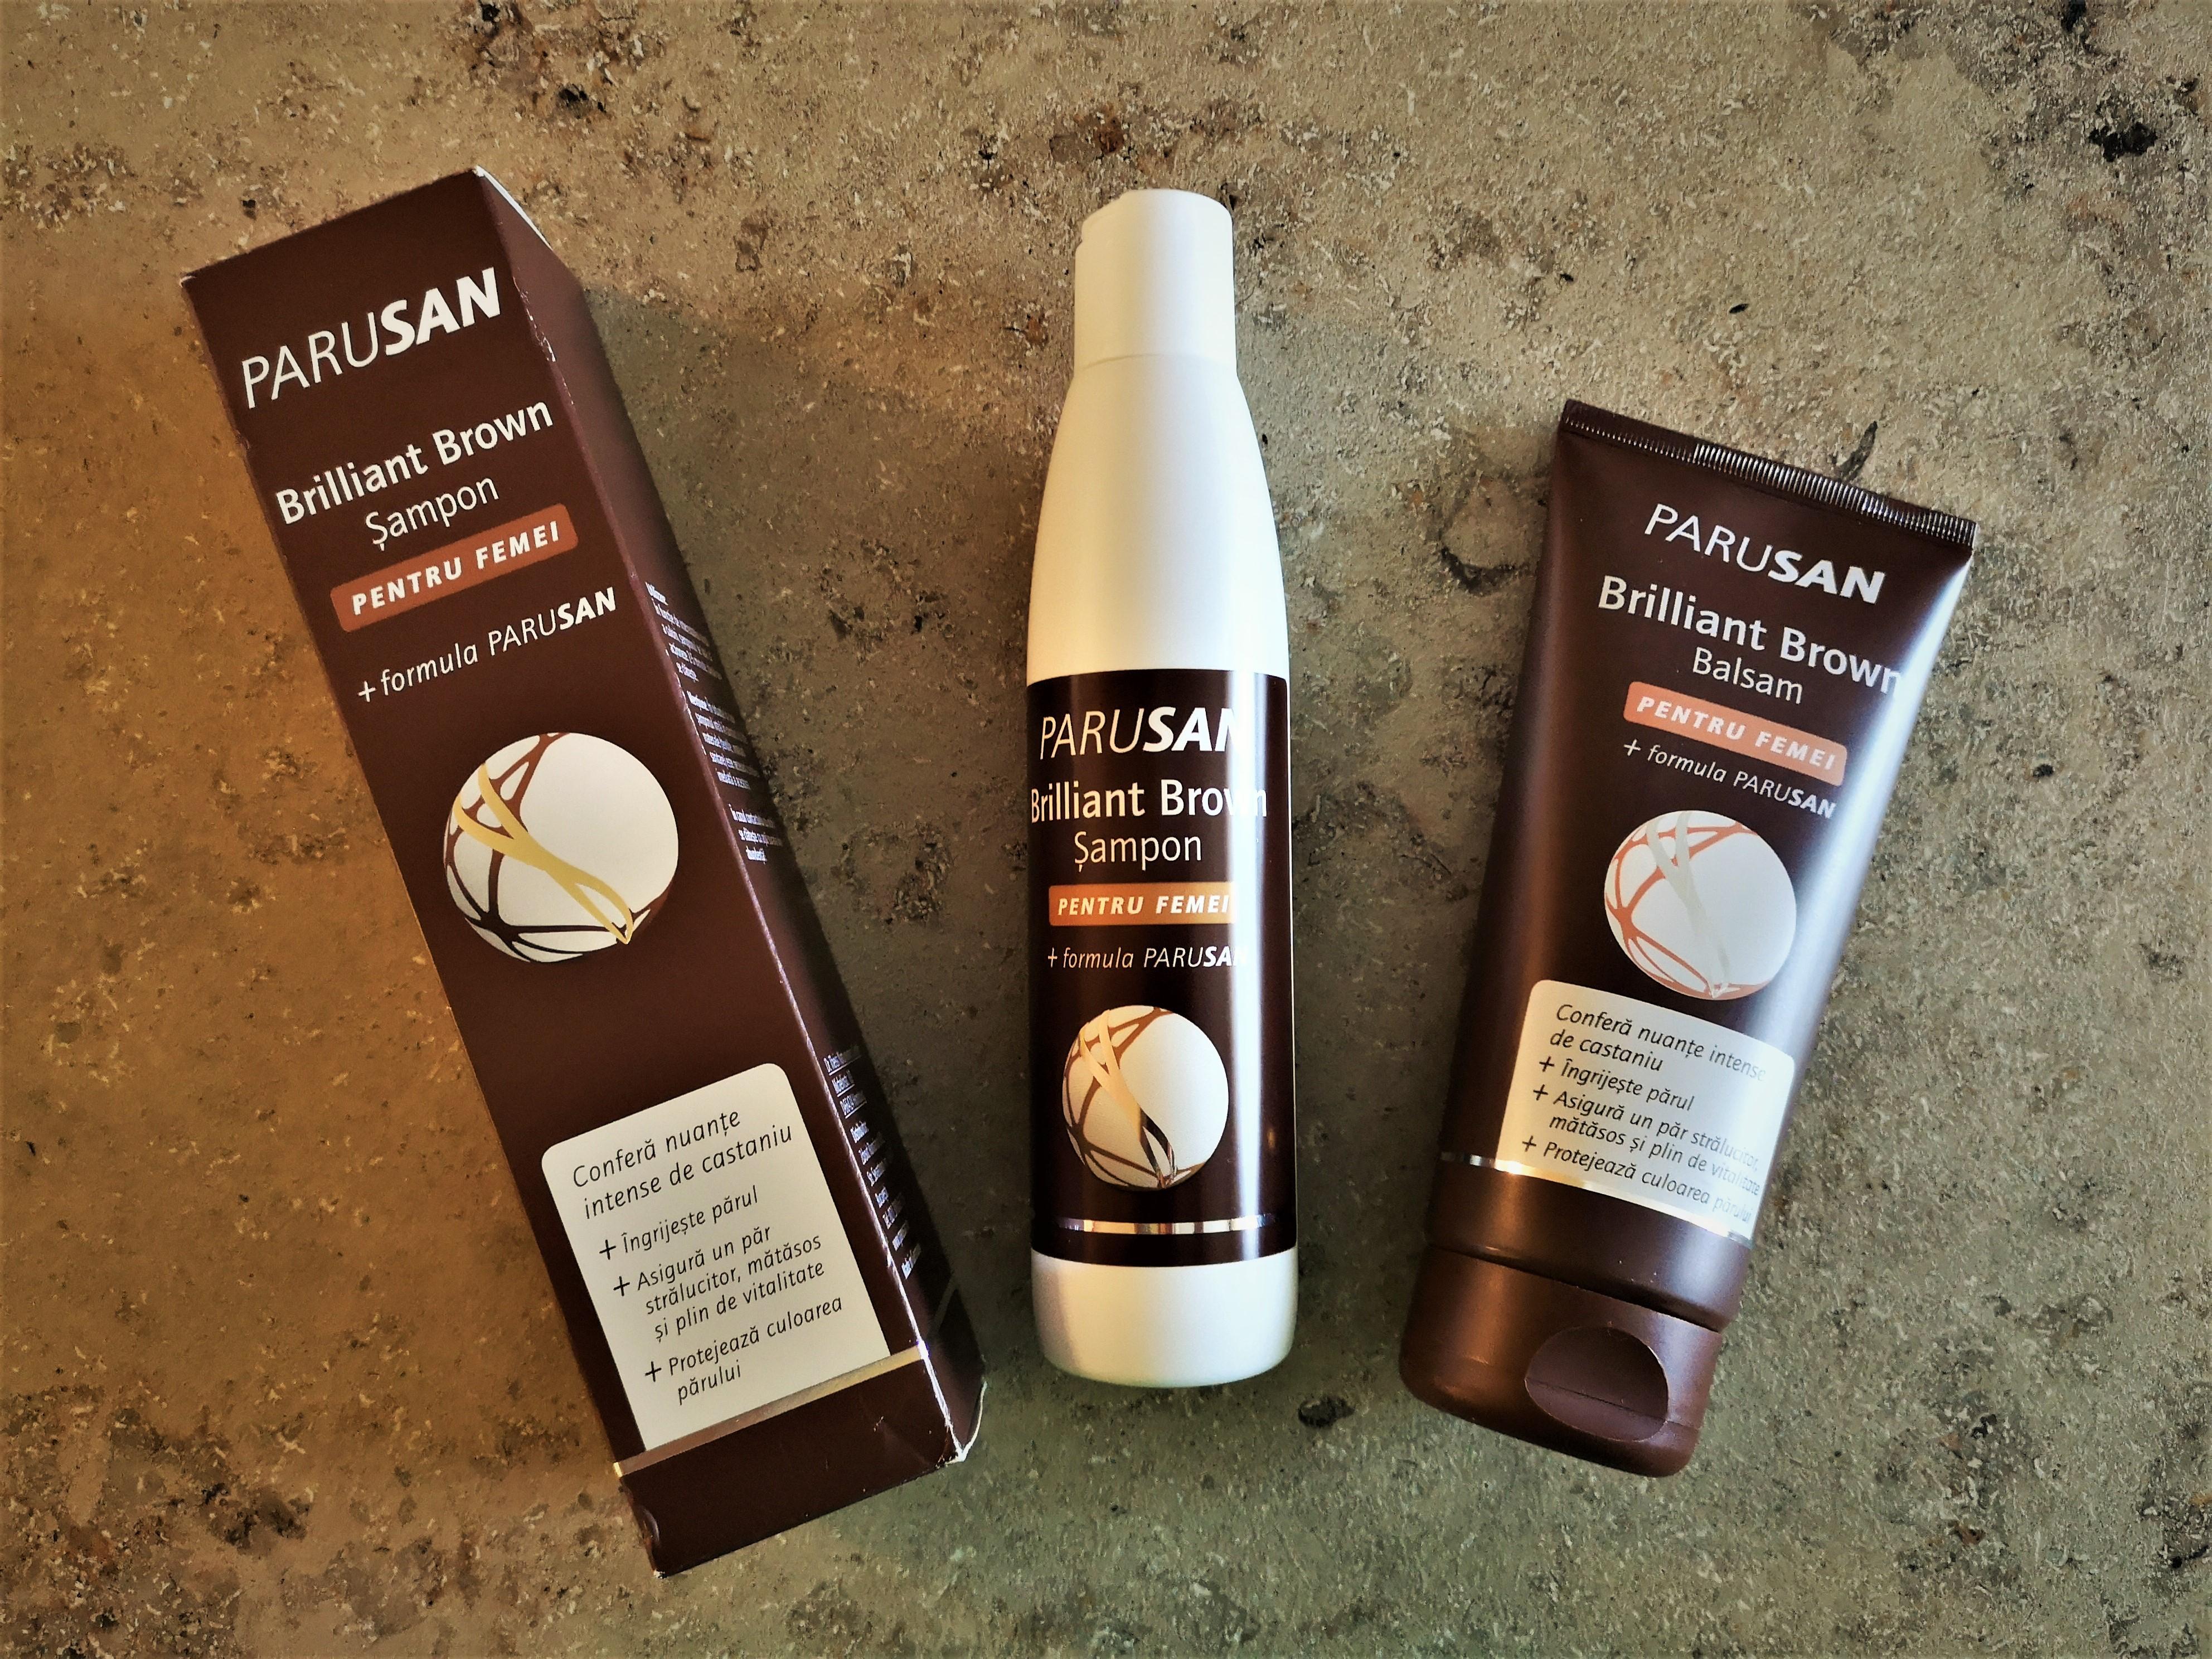 Review: Parusan Brilliant Brown